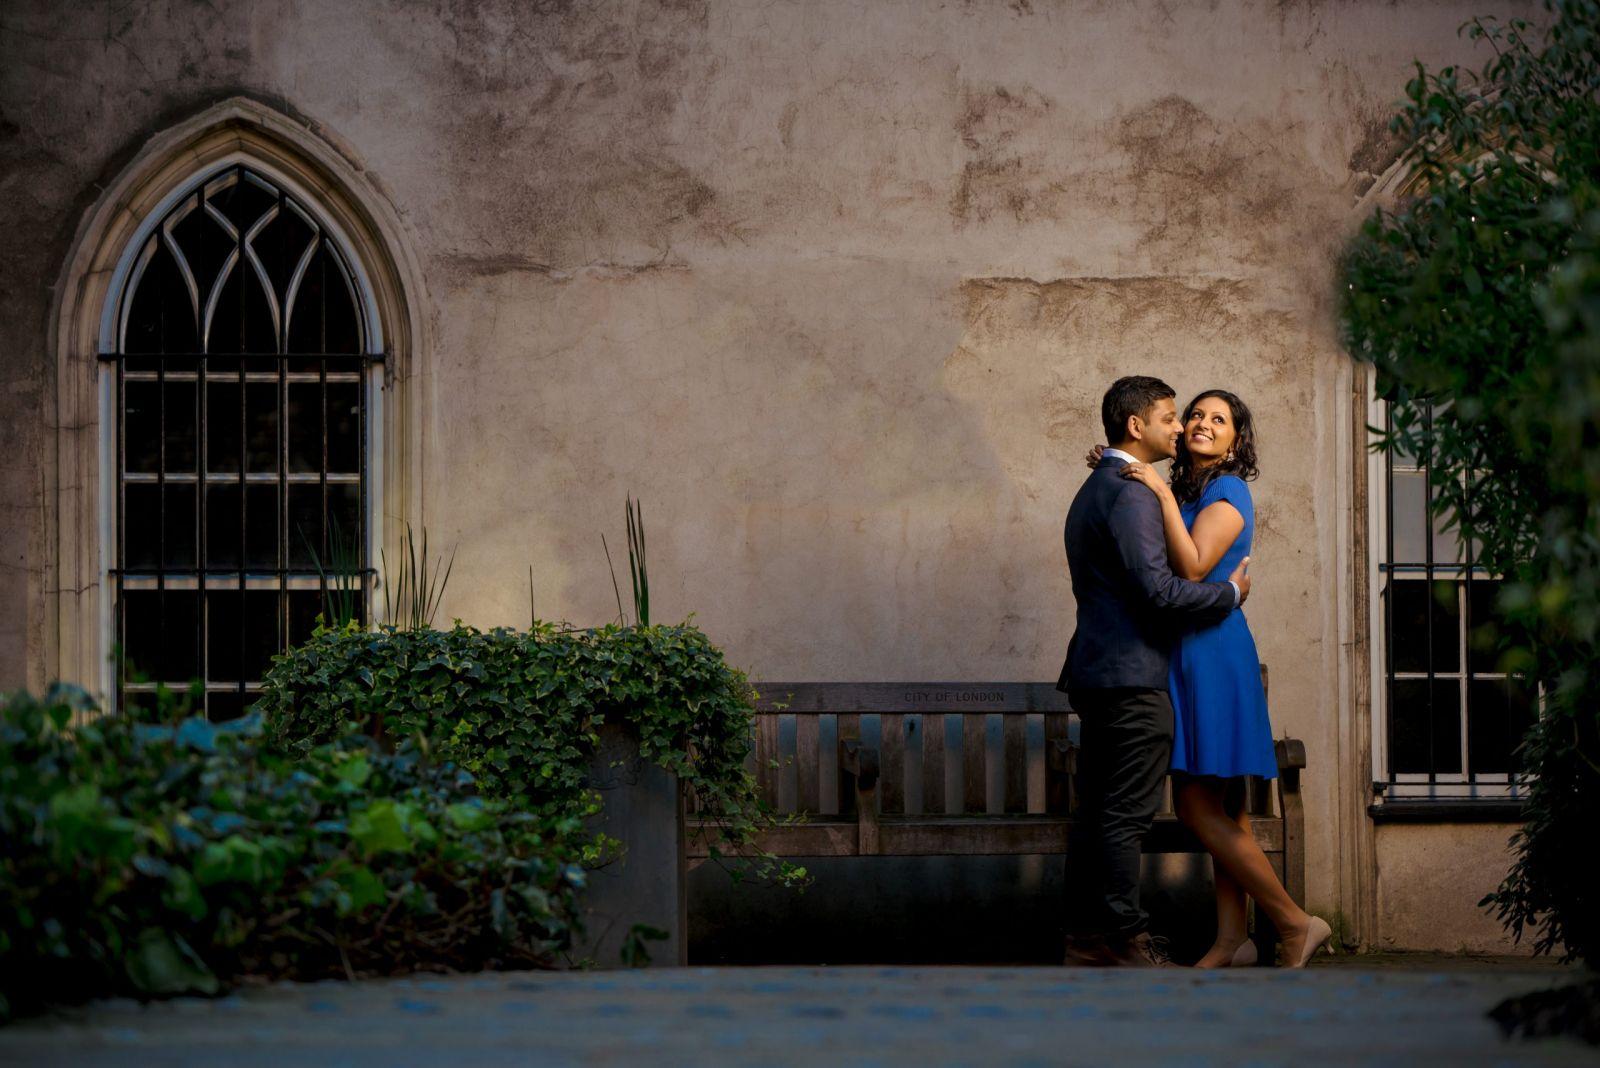 asian wedding photography london 0001